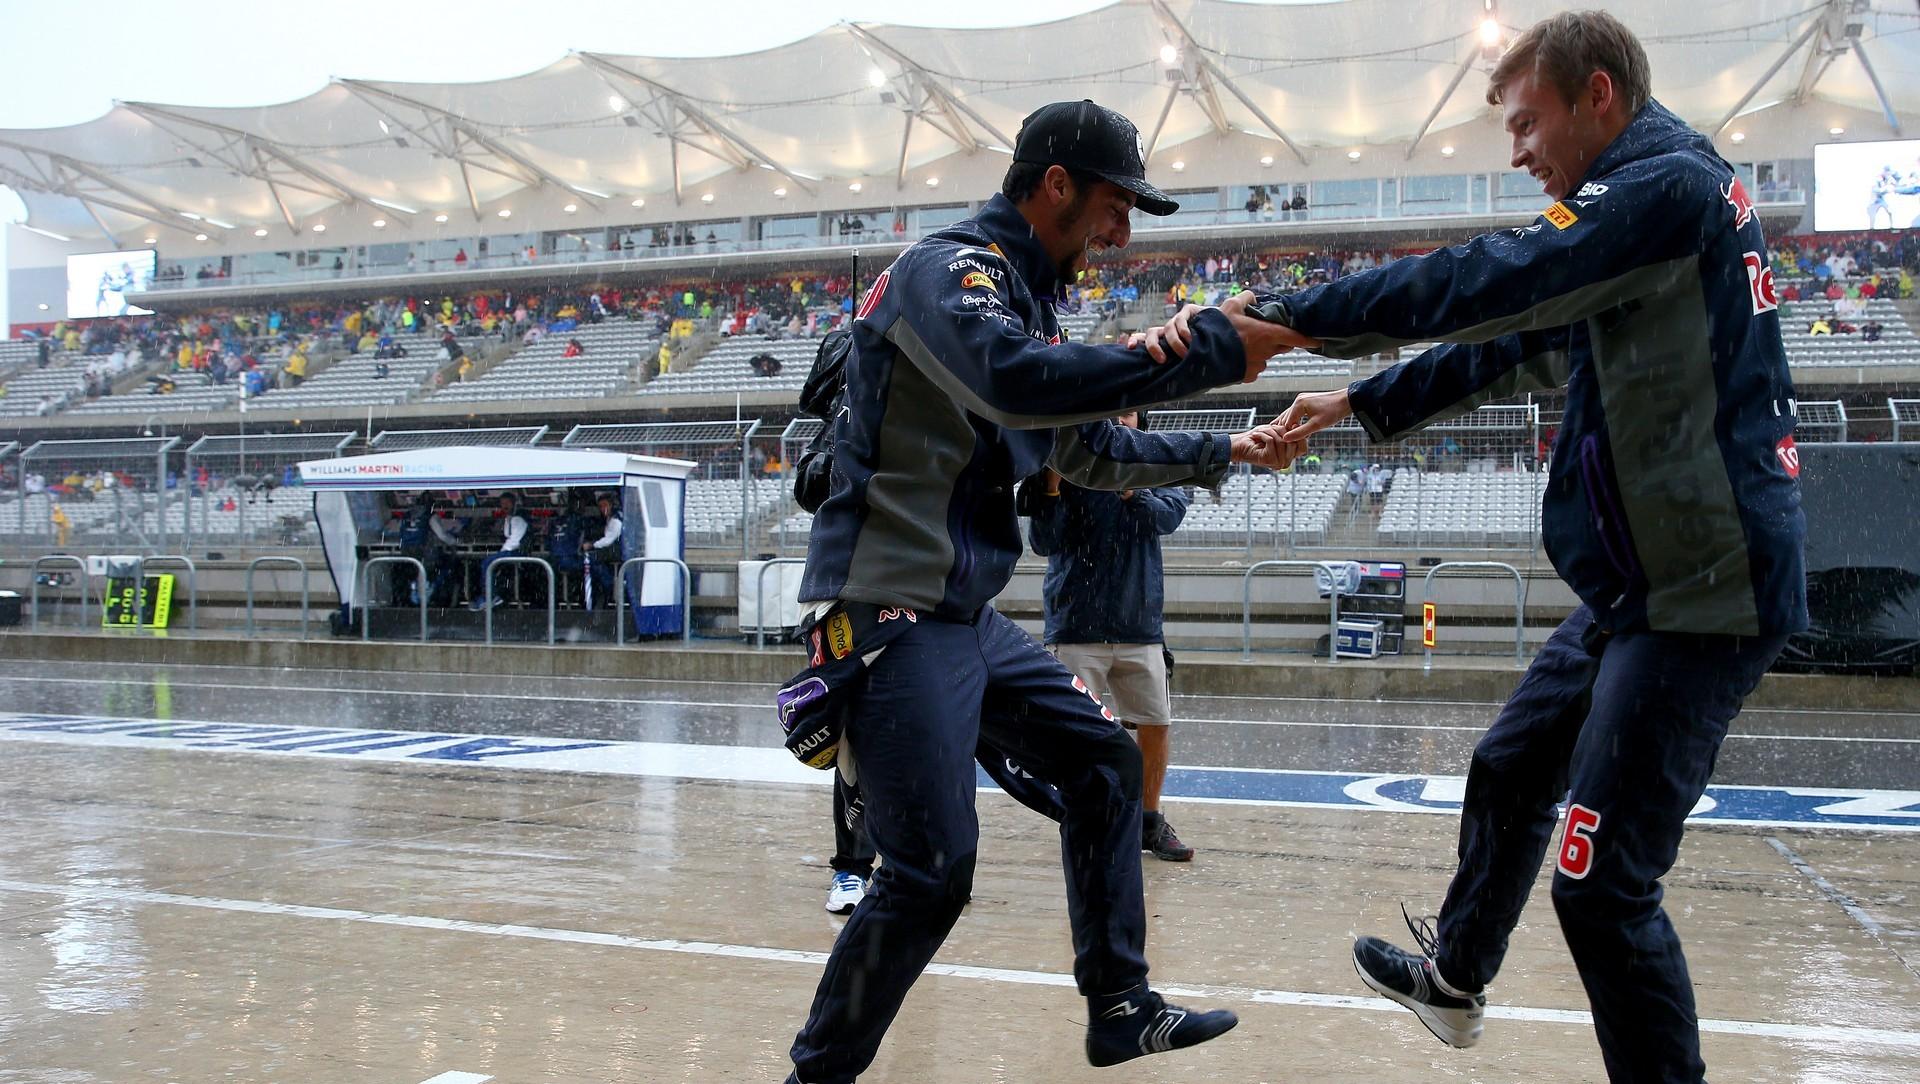 Daniel Ricciardo, Daniil Kvyat, Circuit of the Americas, 2015